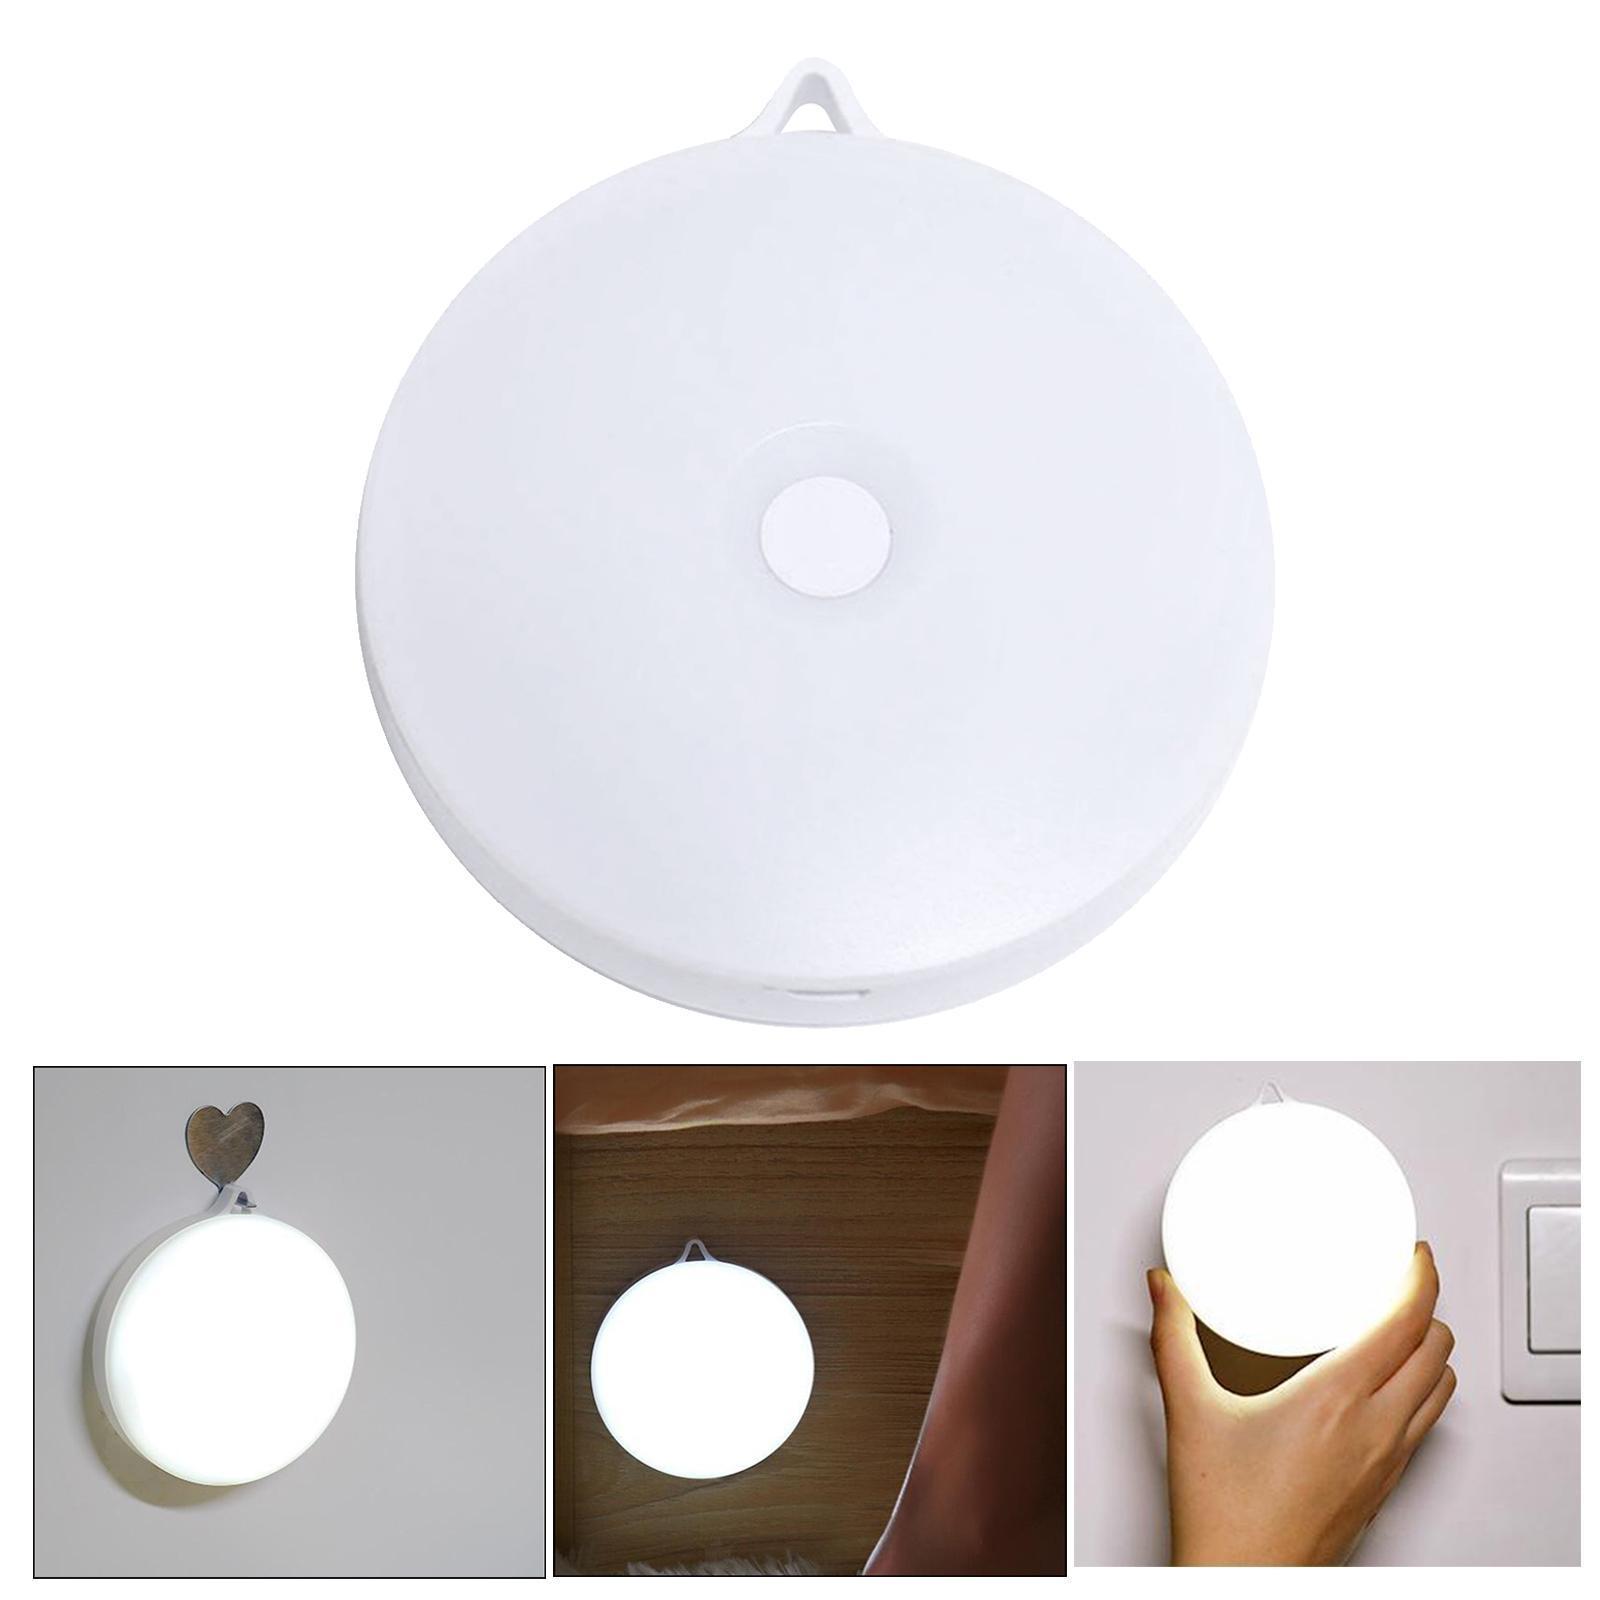 miniatura 24 - Luce notturna a LED per camera da letto ricaricabile USB per Hotel con sensore